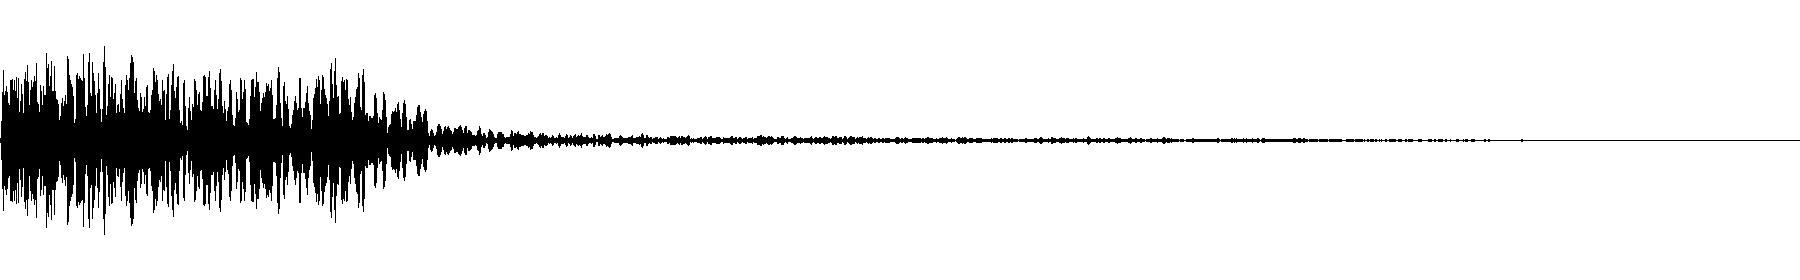 vedh synth cut 159 am